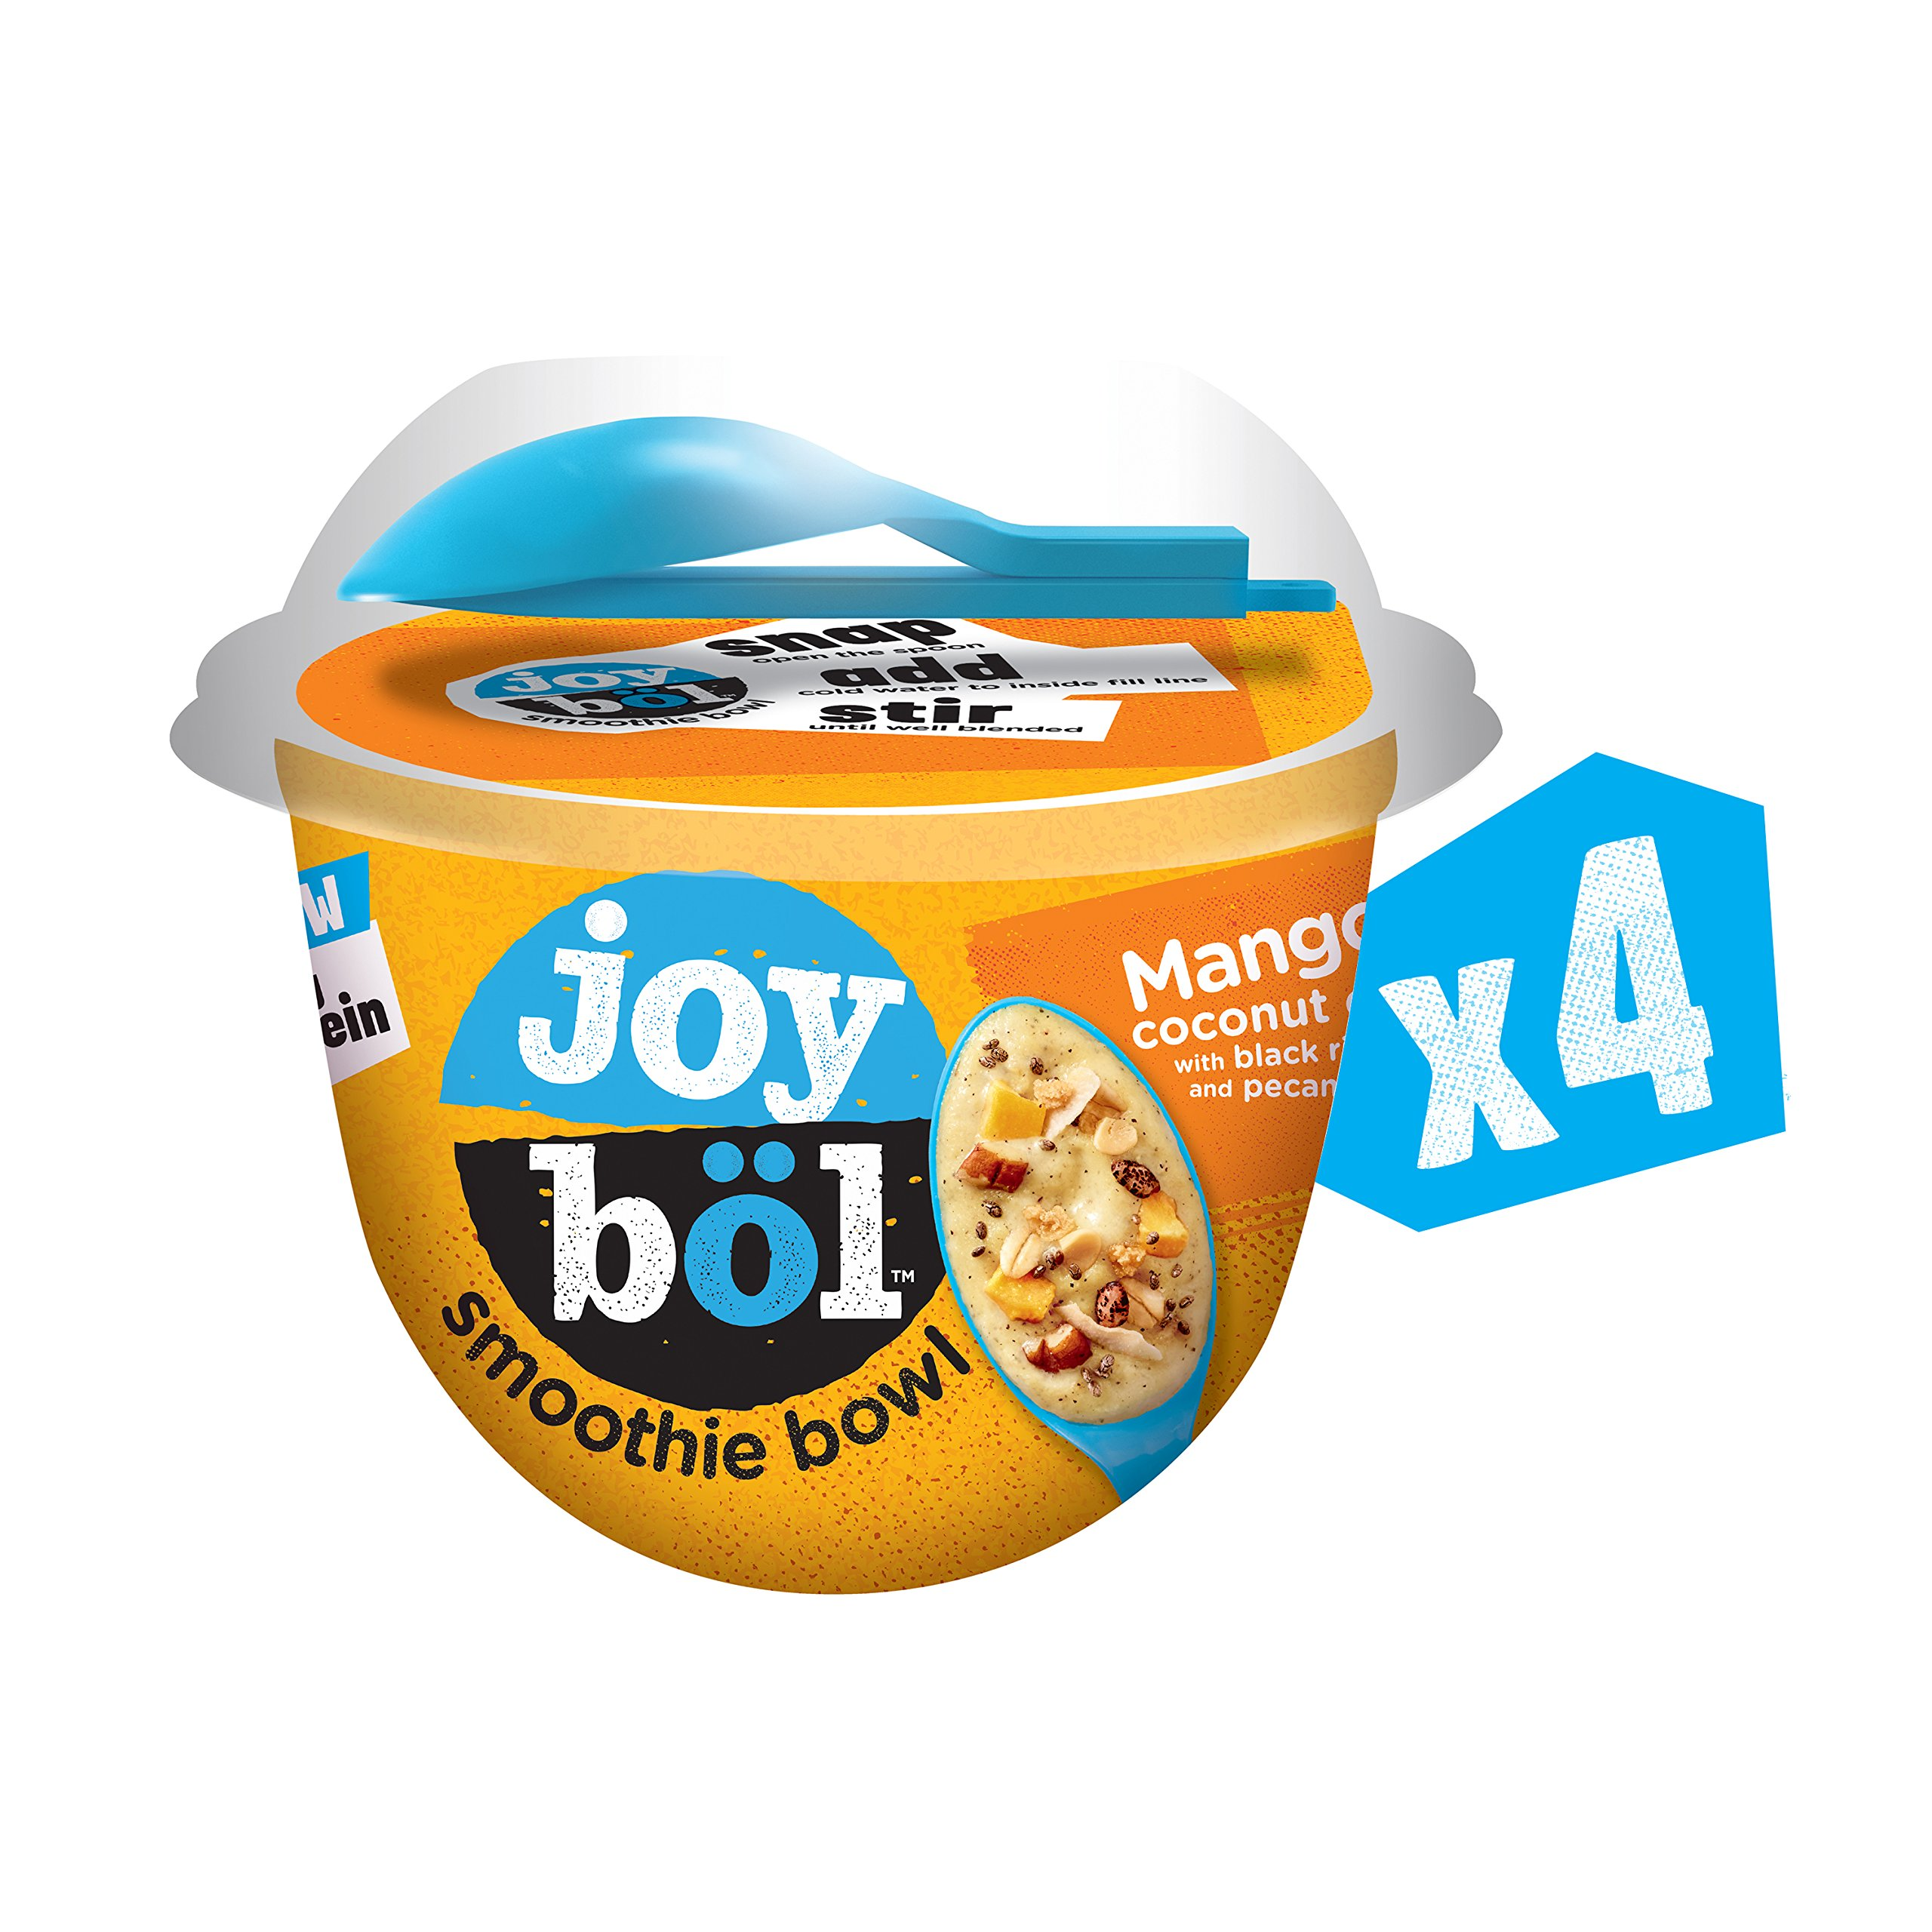 joyböl Smoothie Bowls, Mango Coconut Chia, Easy Breakfast, Non-GMO, 4 Count by joyböl